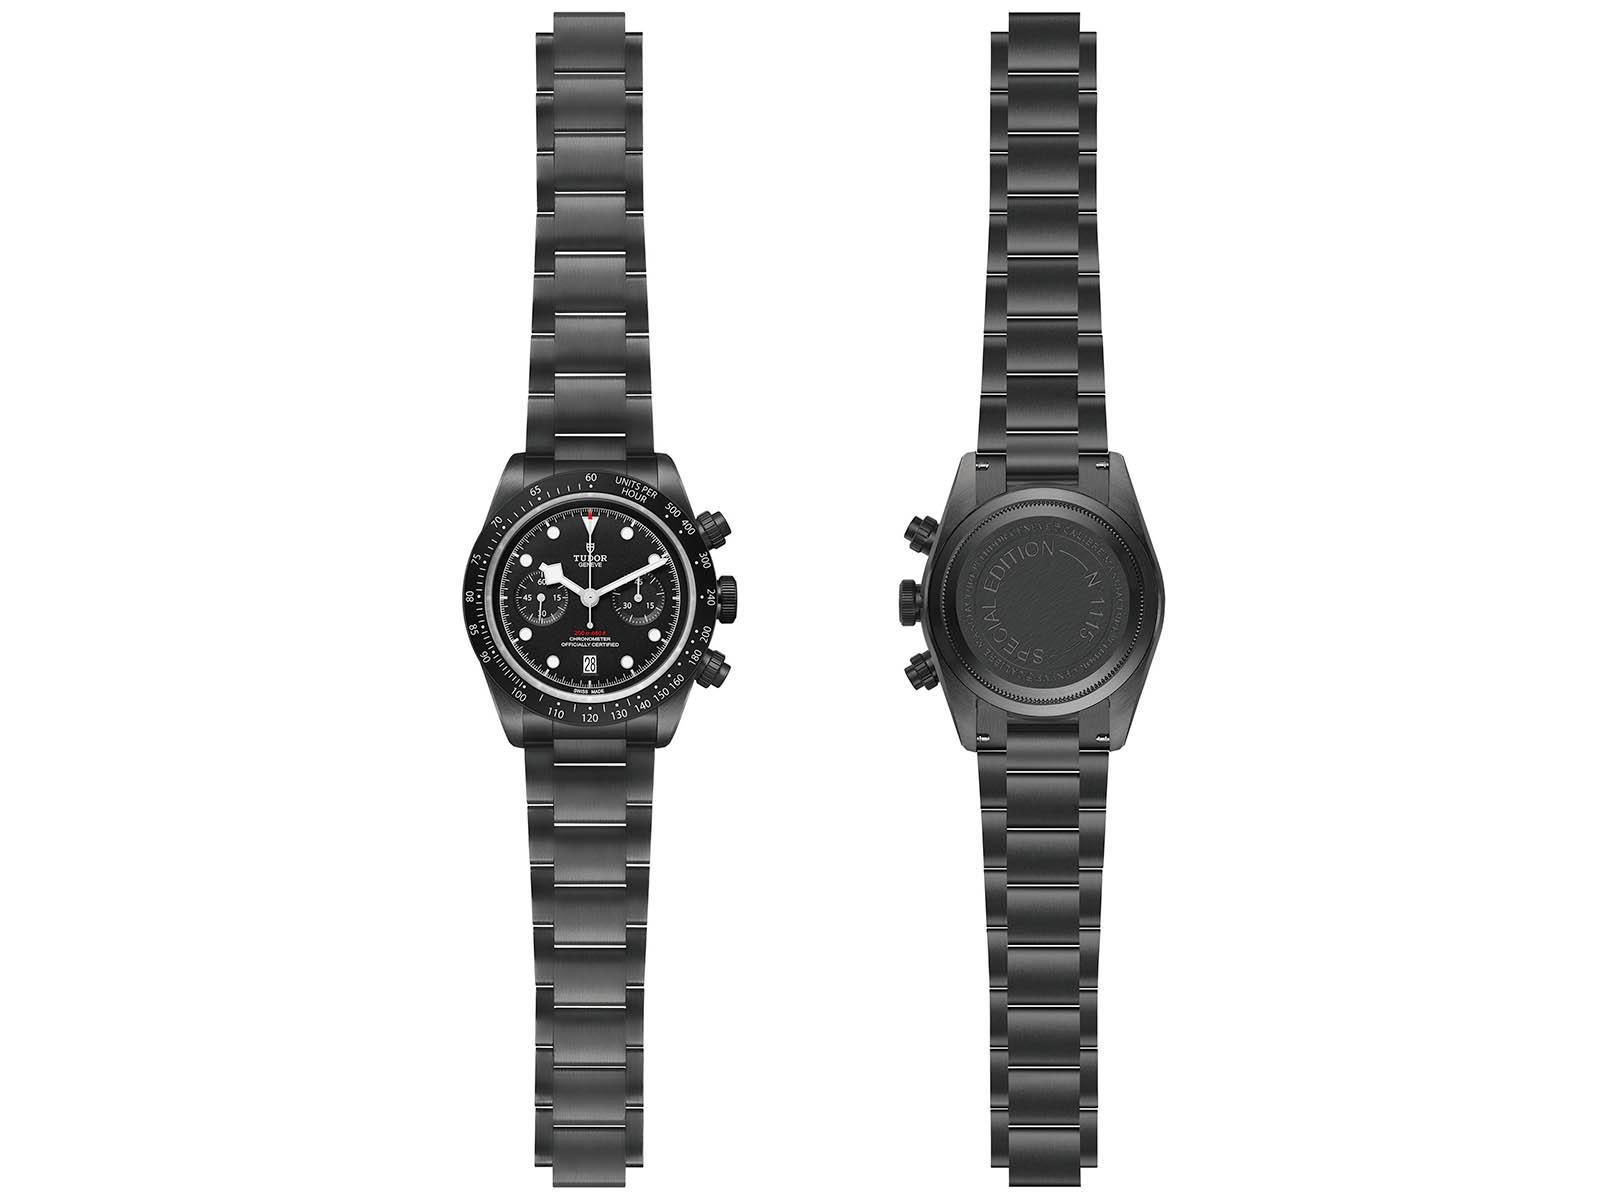 79360dk-tudor-black-bay-chrono-dark-limited-edition-3.jpg